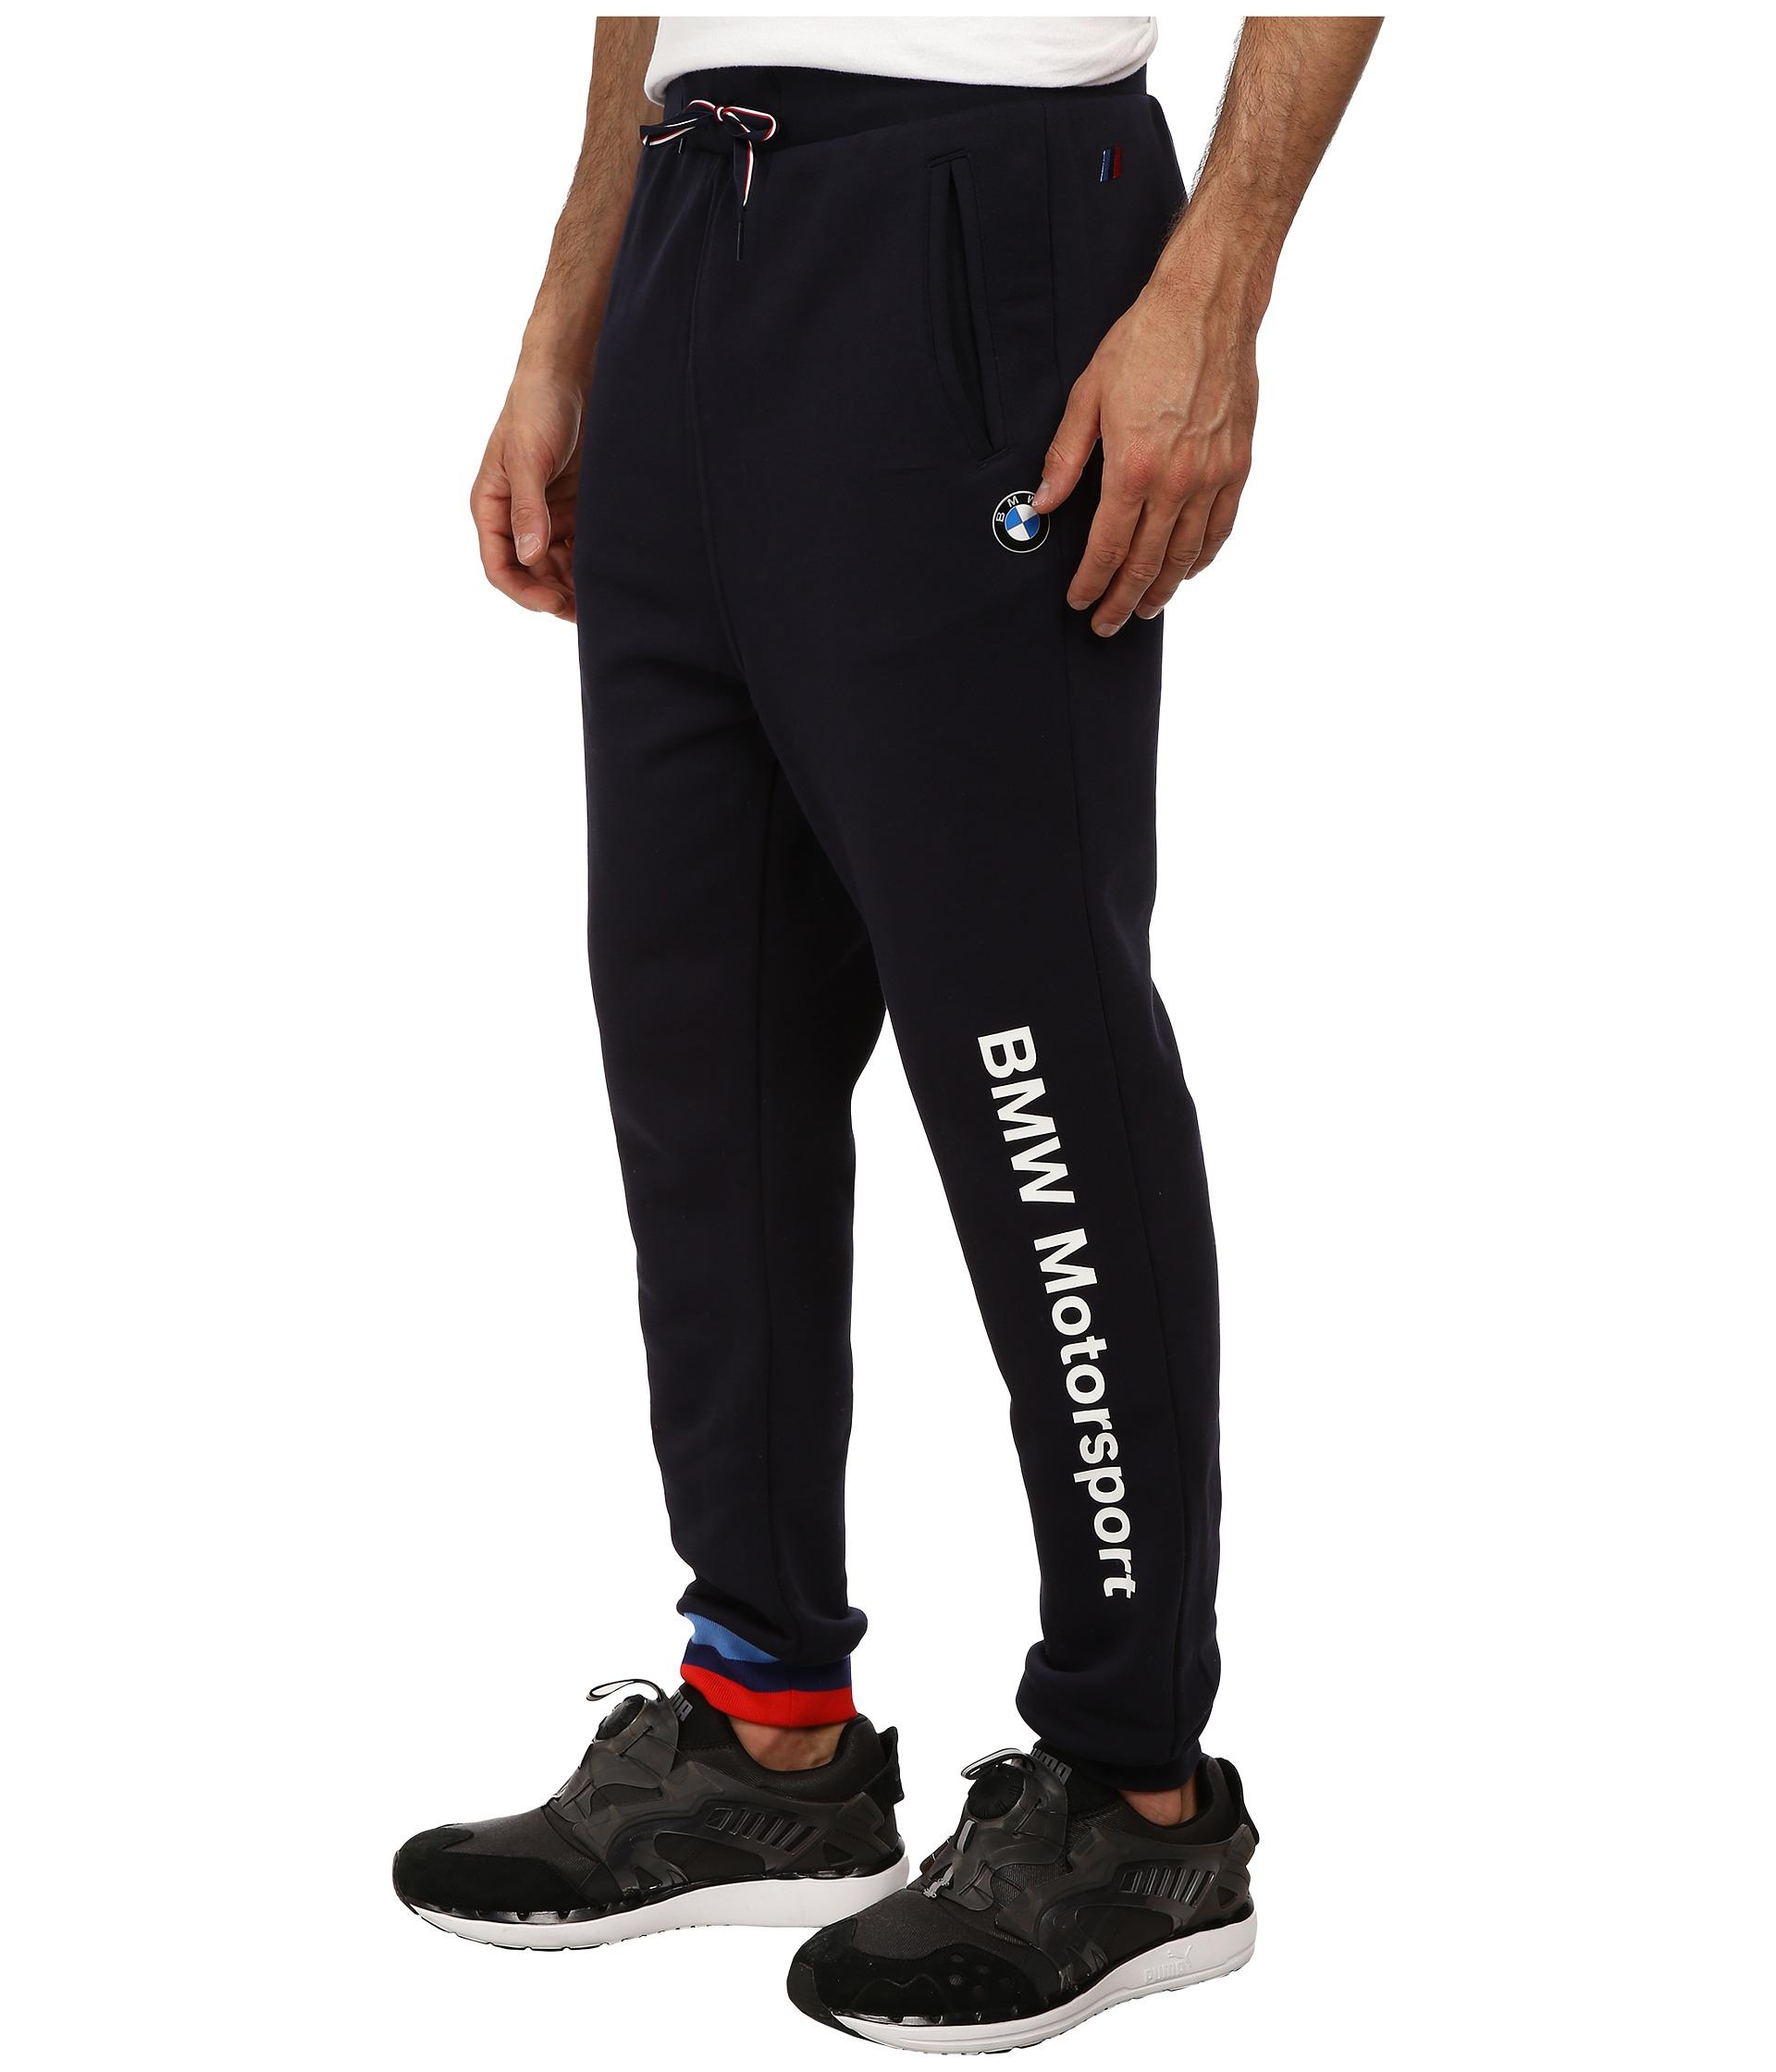 d0b7d67552c6 Lyst - PUMA Bmw Msp Sweat Pants in Blue for Men